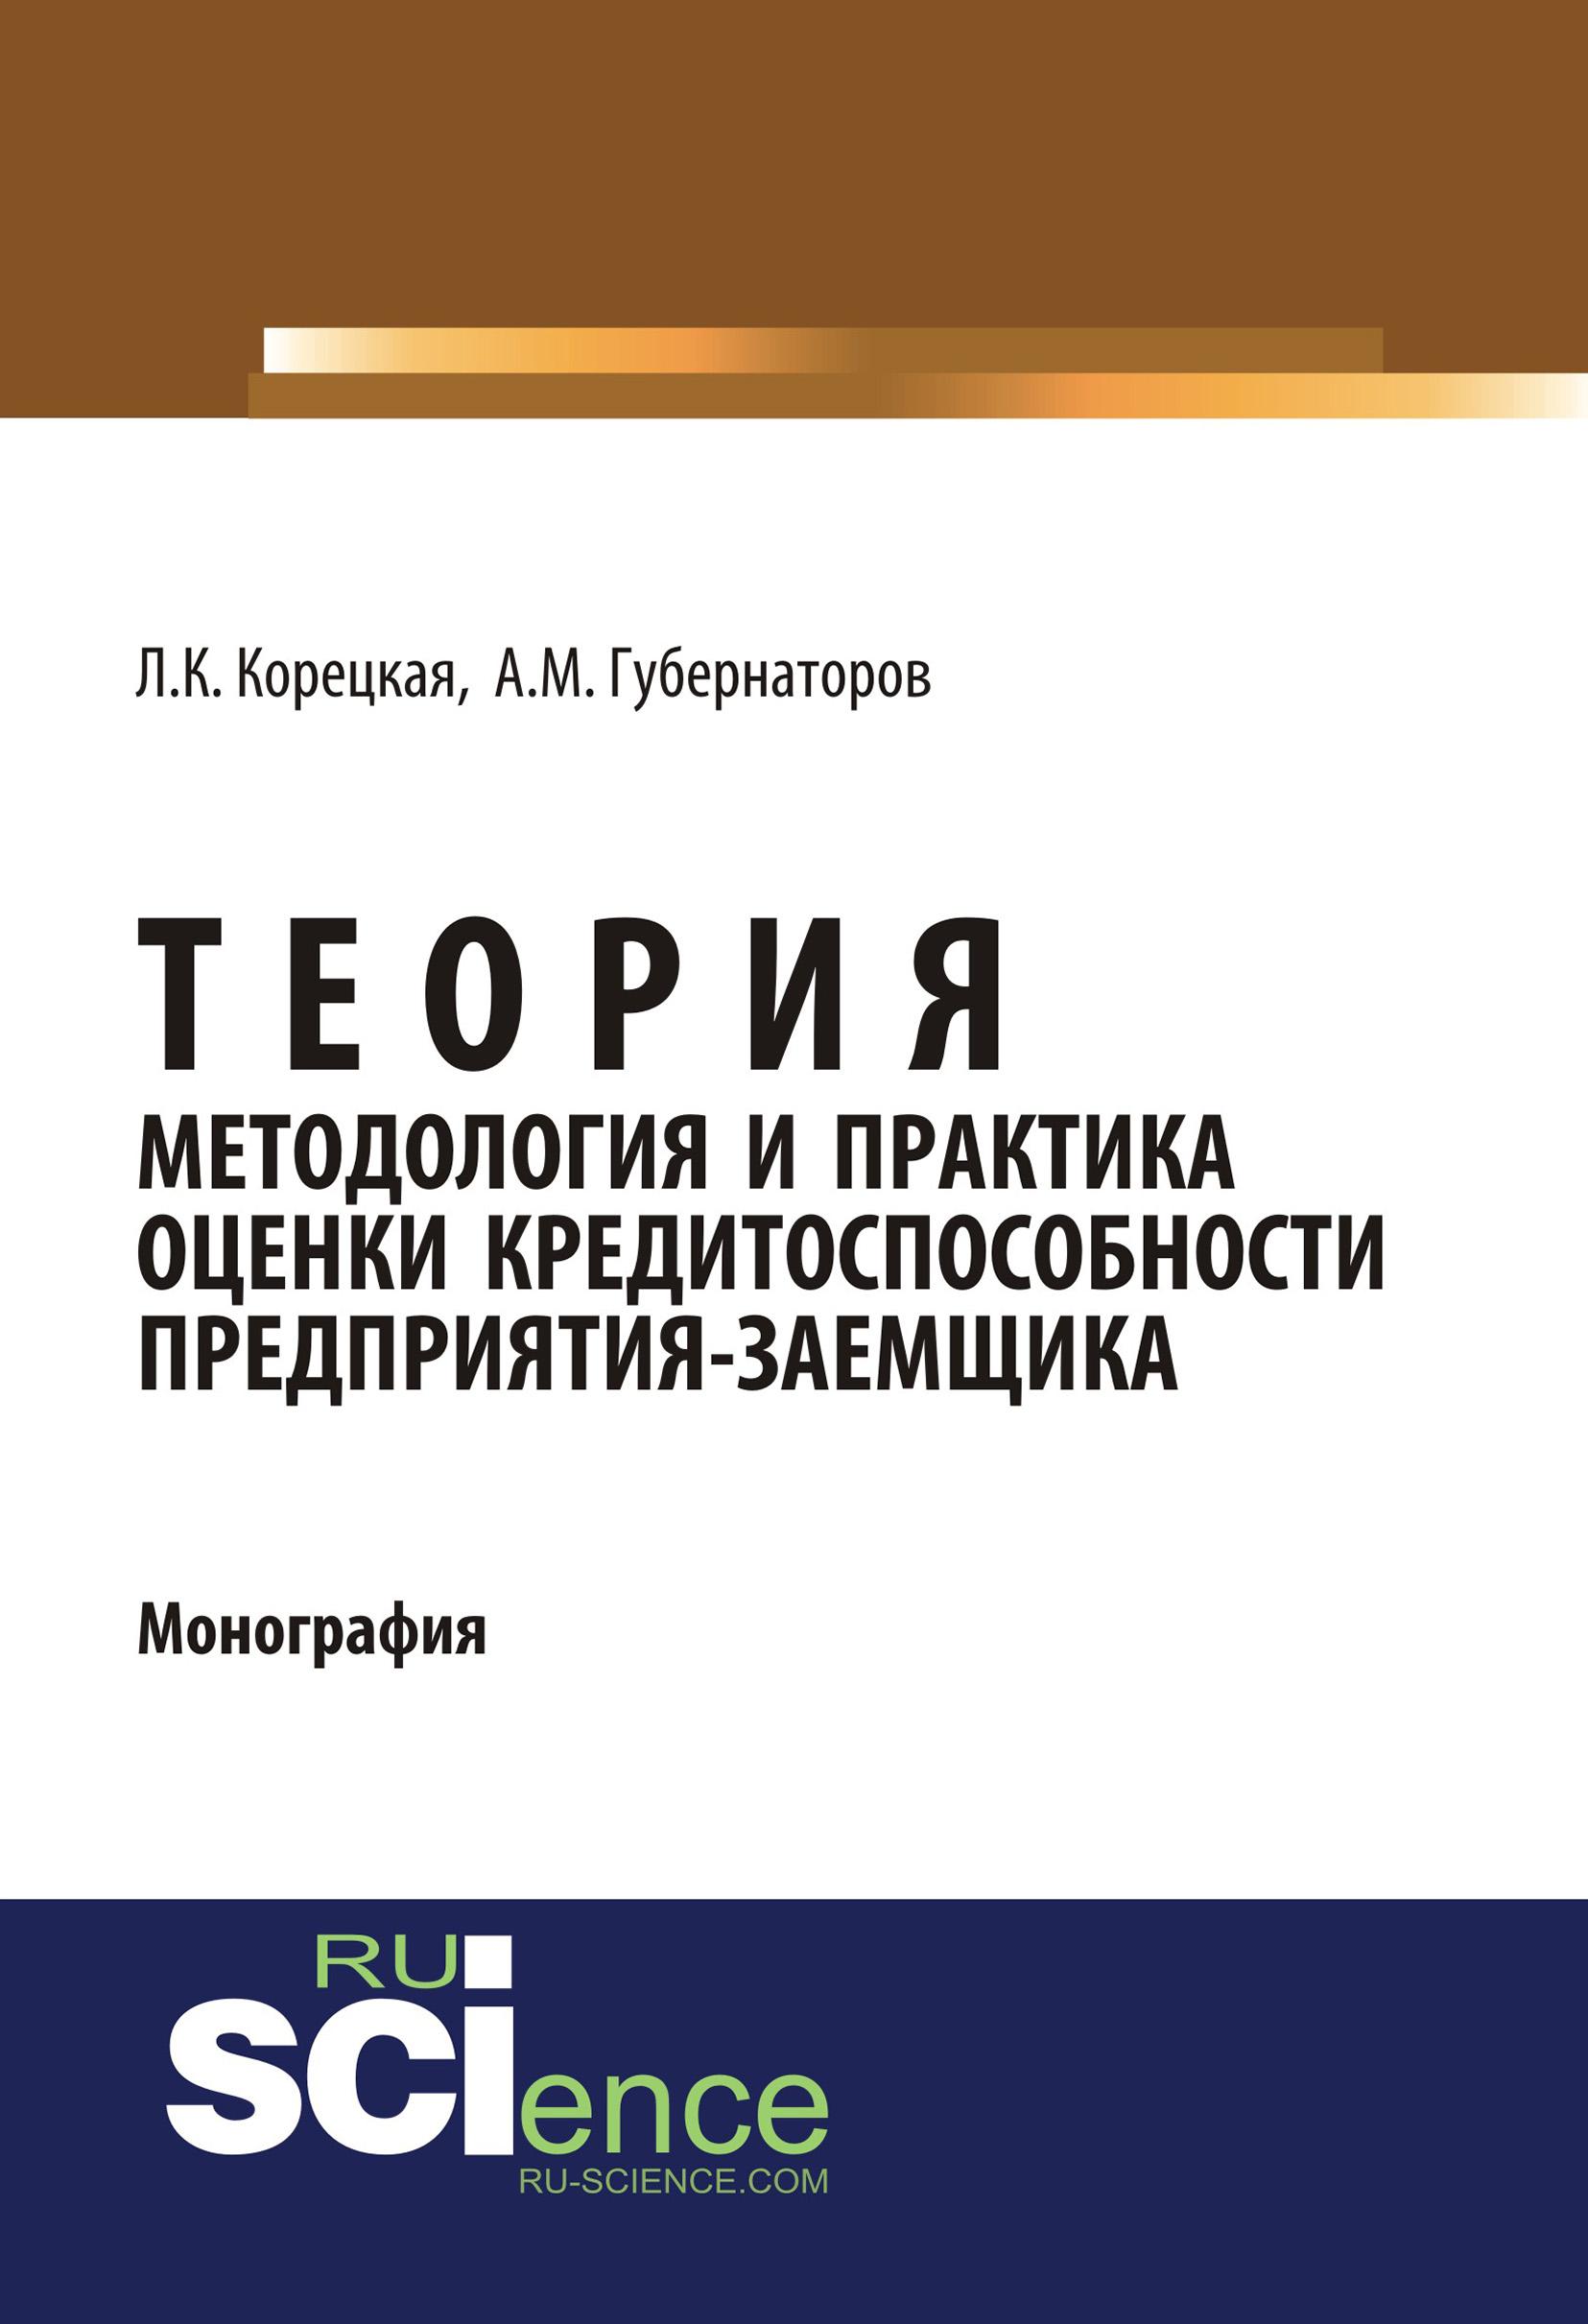 Алексей Михайлович Губернаторов Теория, методология и практика оценки кредитоспособности предприятия-заемщика